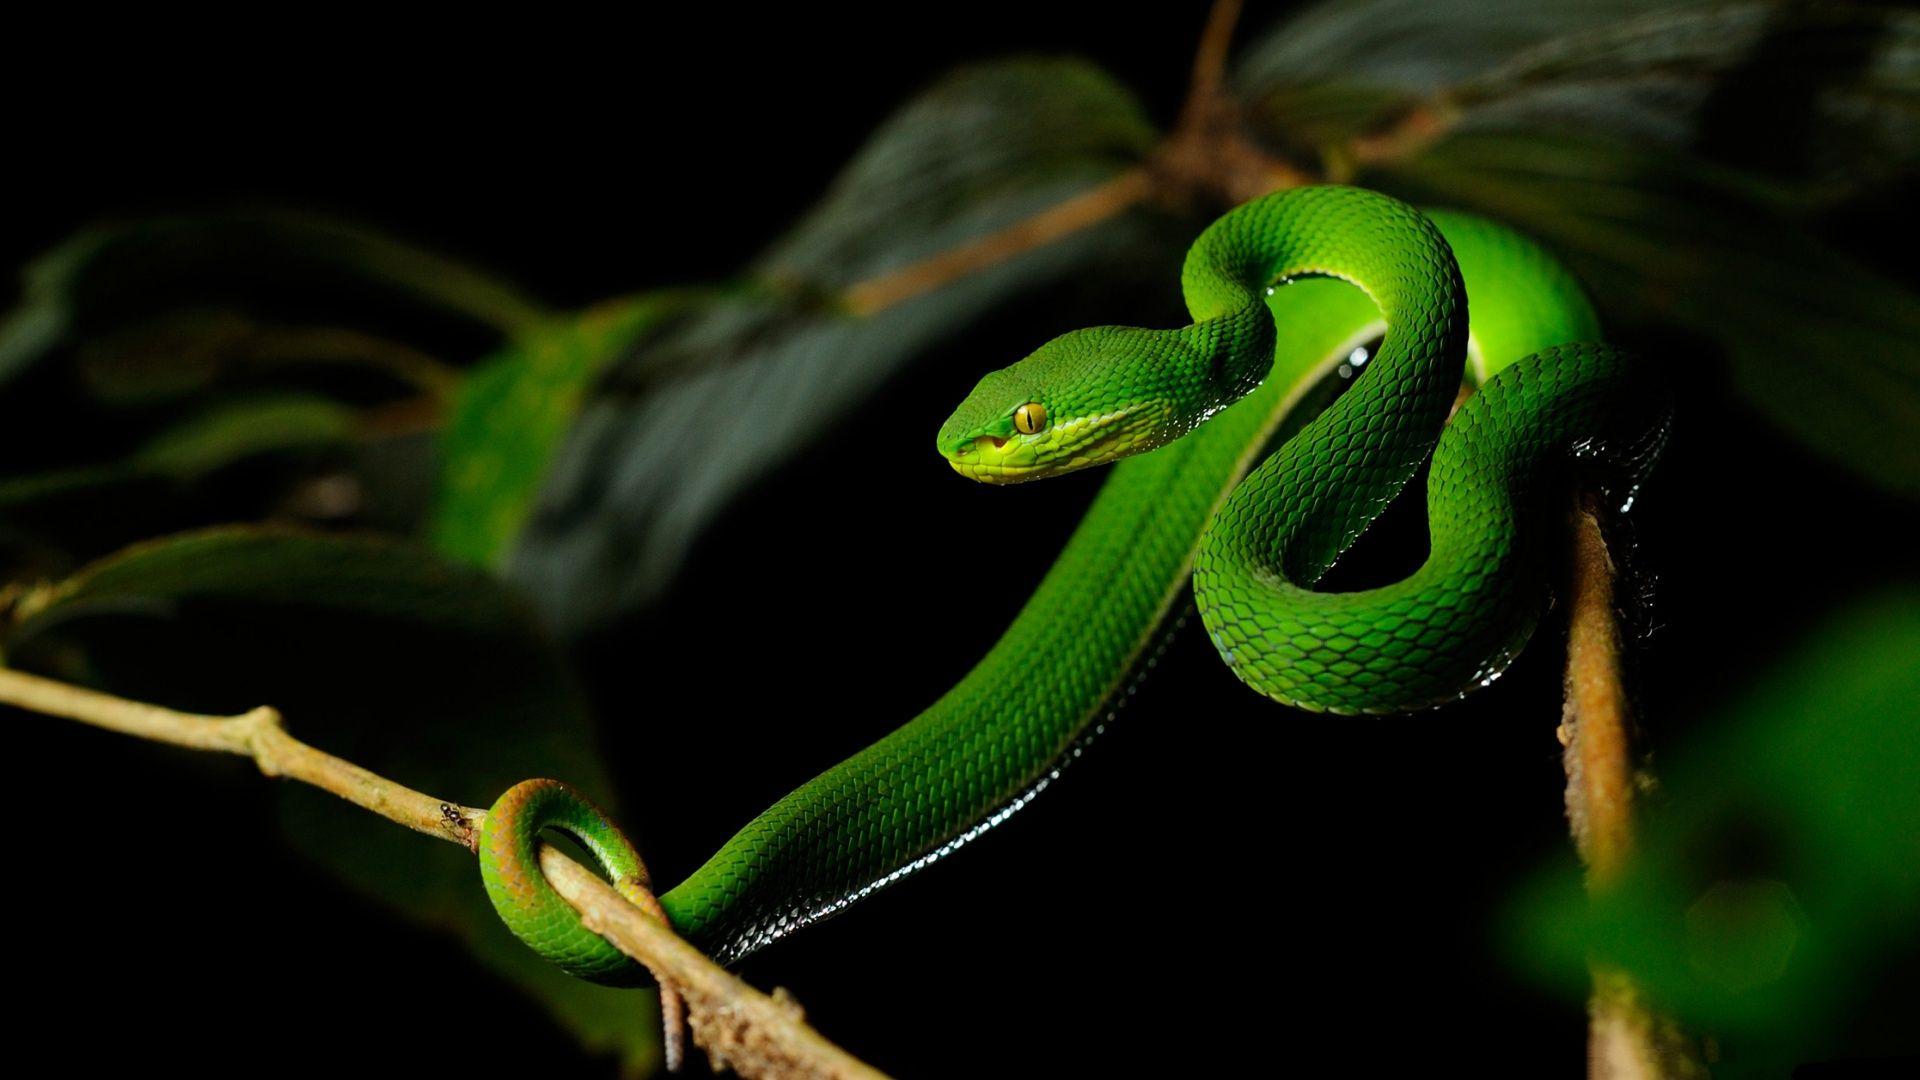 Bright Green Snake